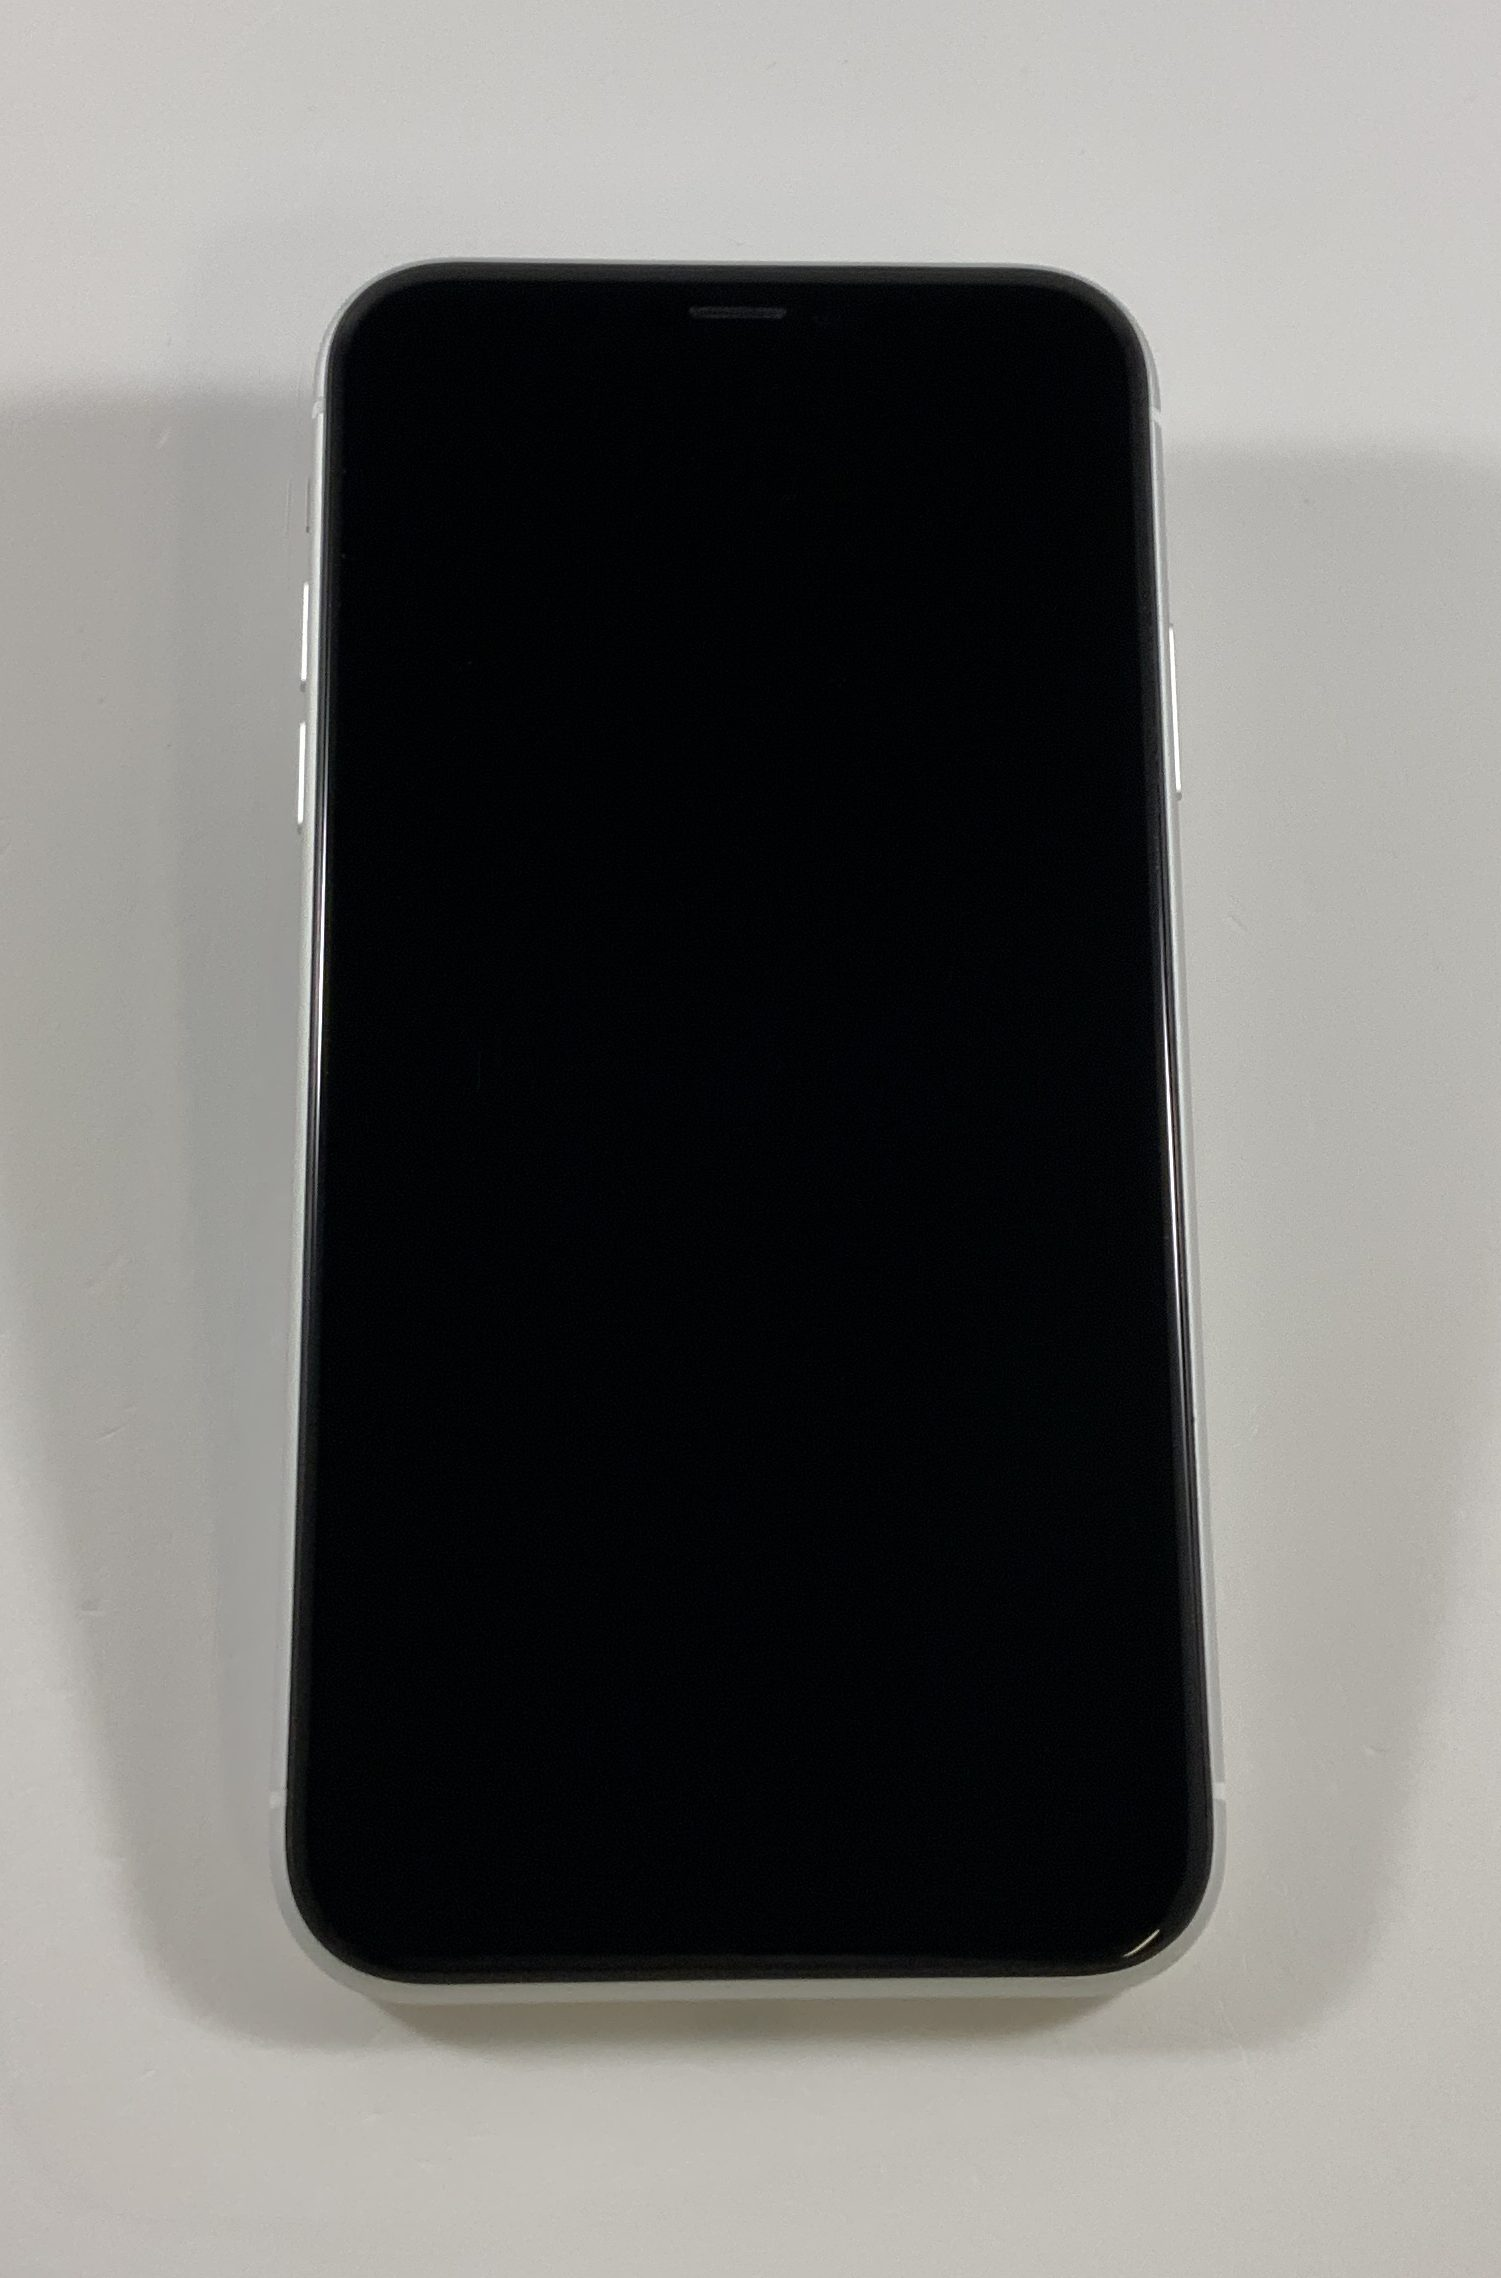 iPhone XR 128GB, 128GB, White, Bild 1